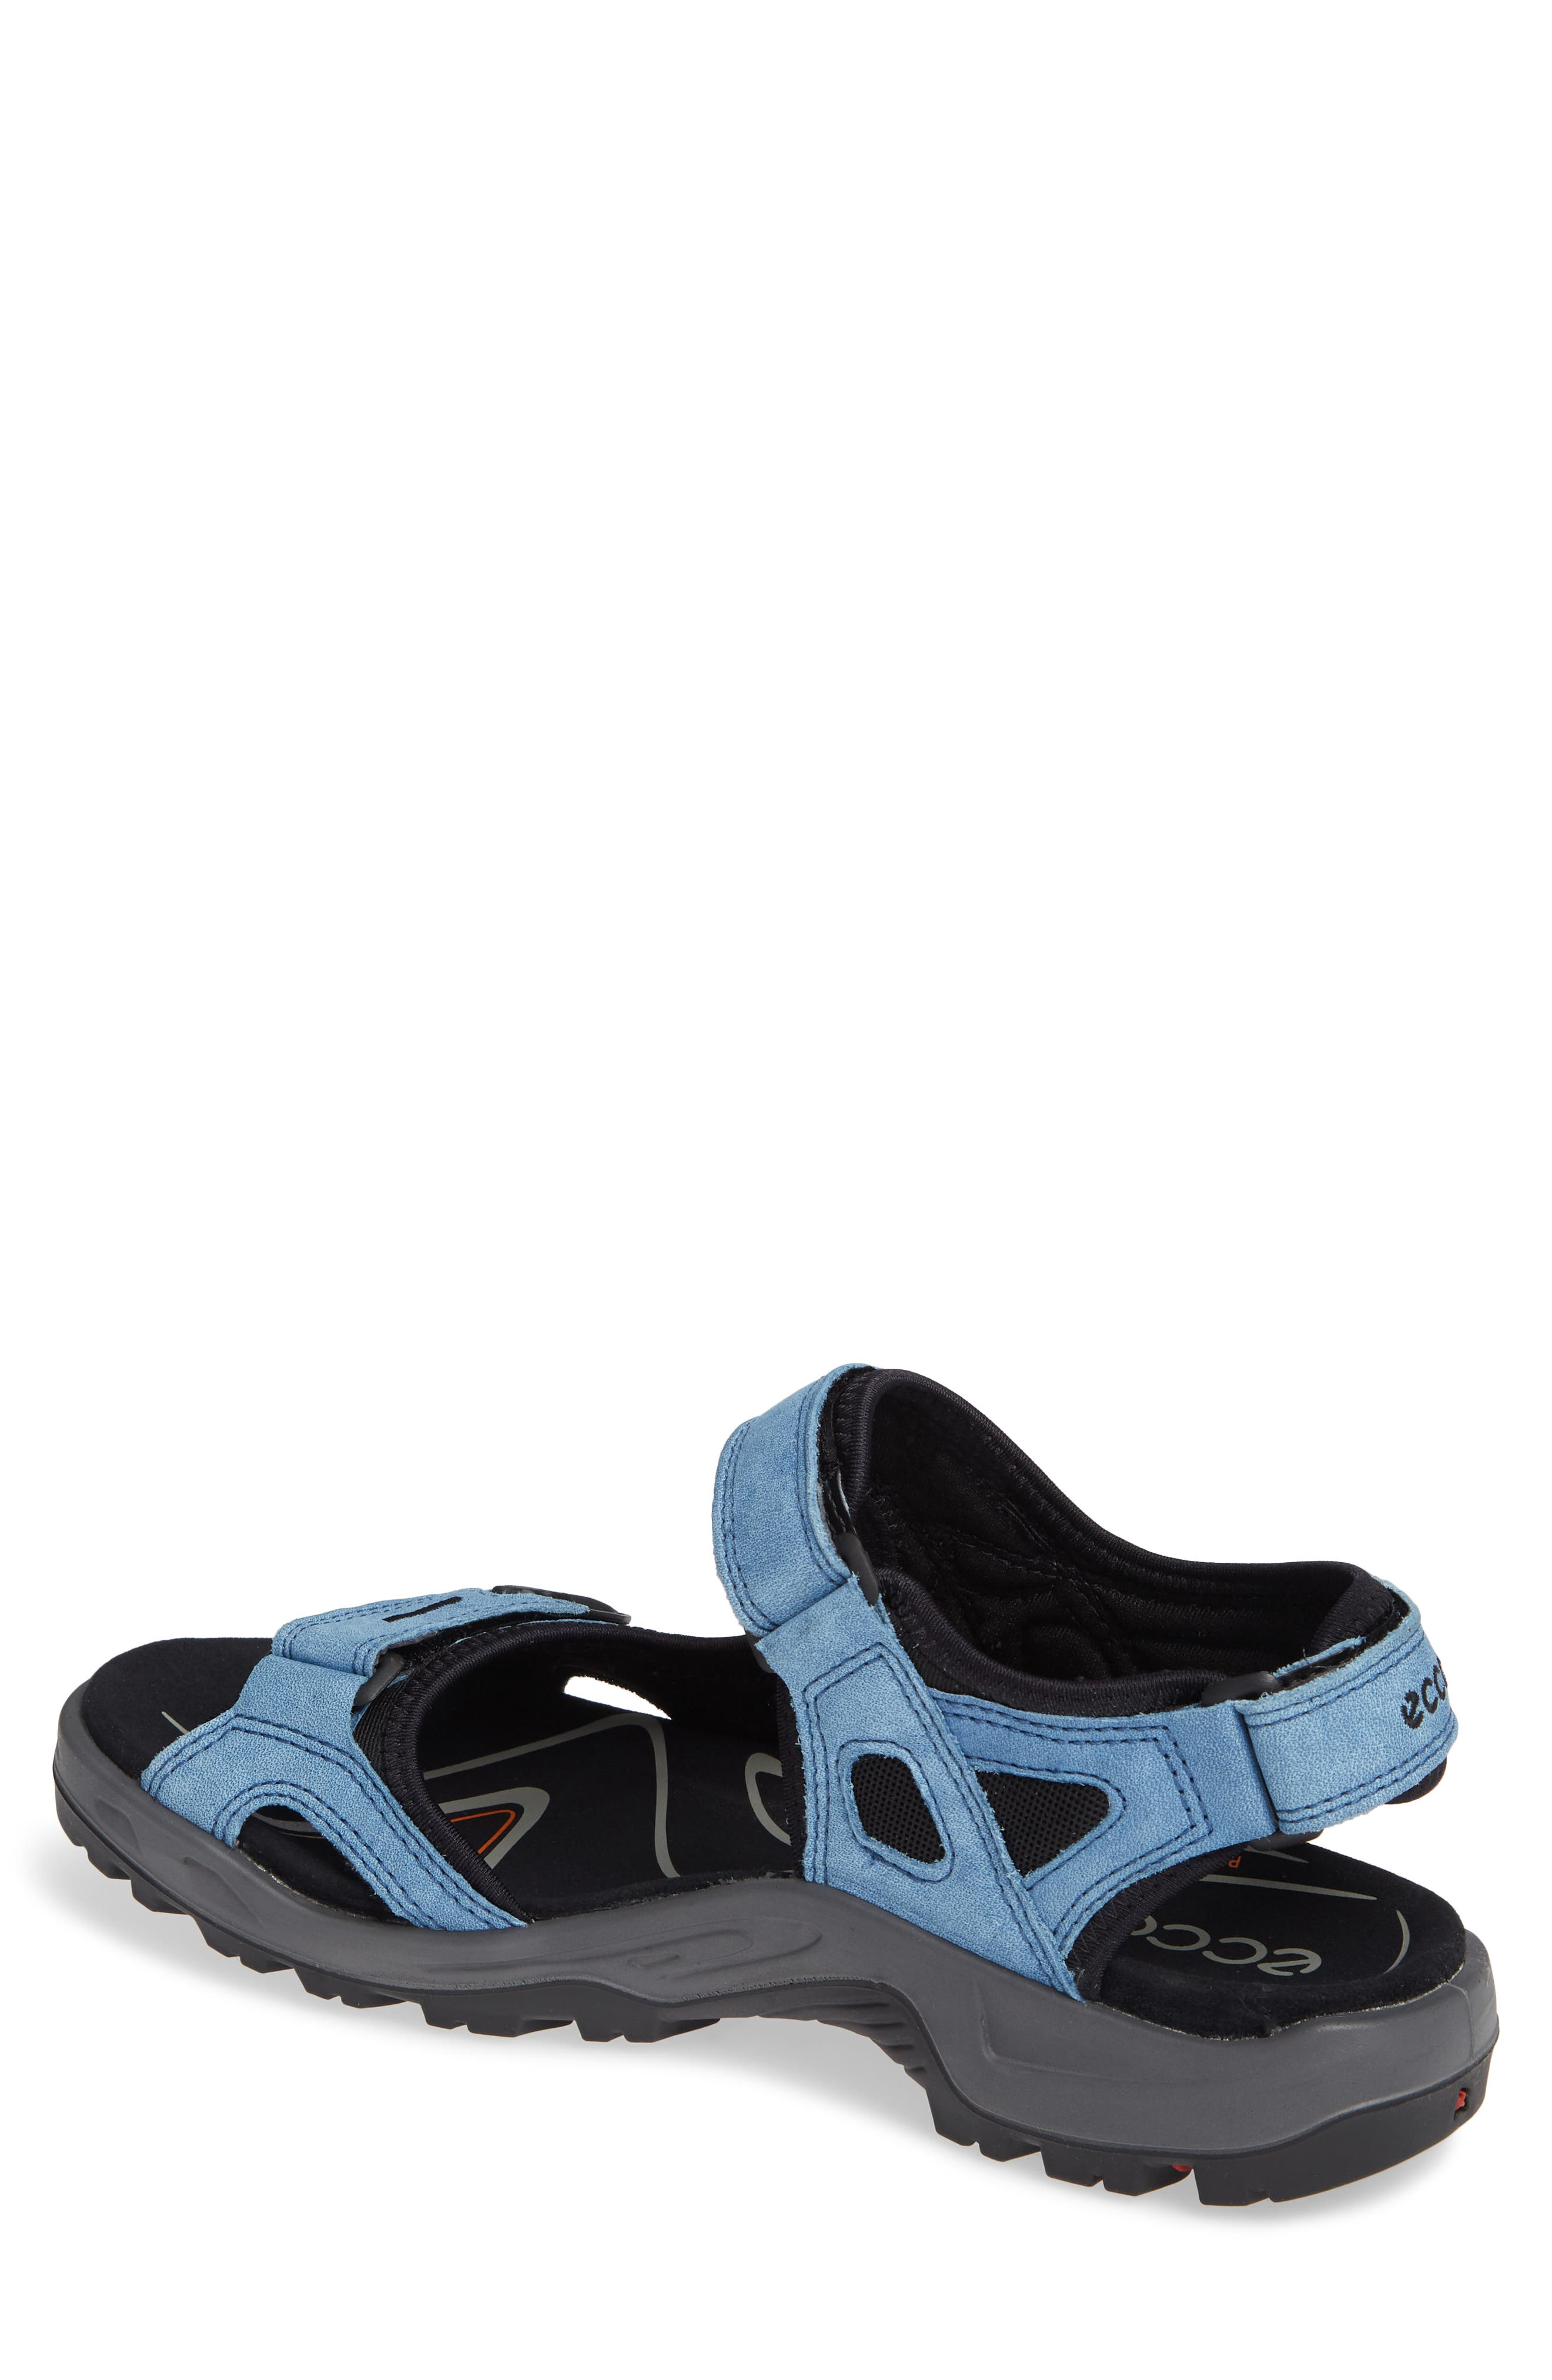 Offroad Sport Sandal,                             Alternate thumbnail 2, color,                             INDIGO LEATHER